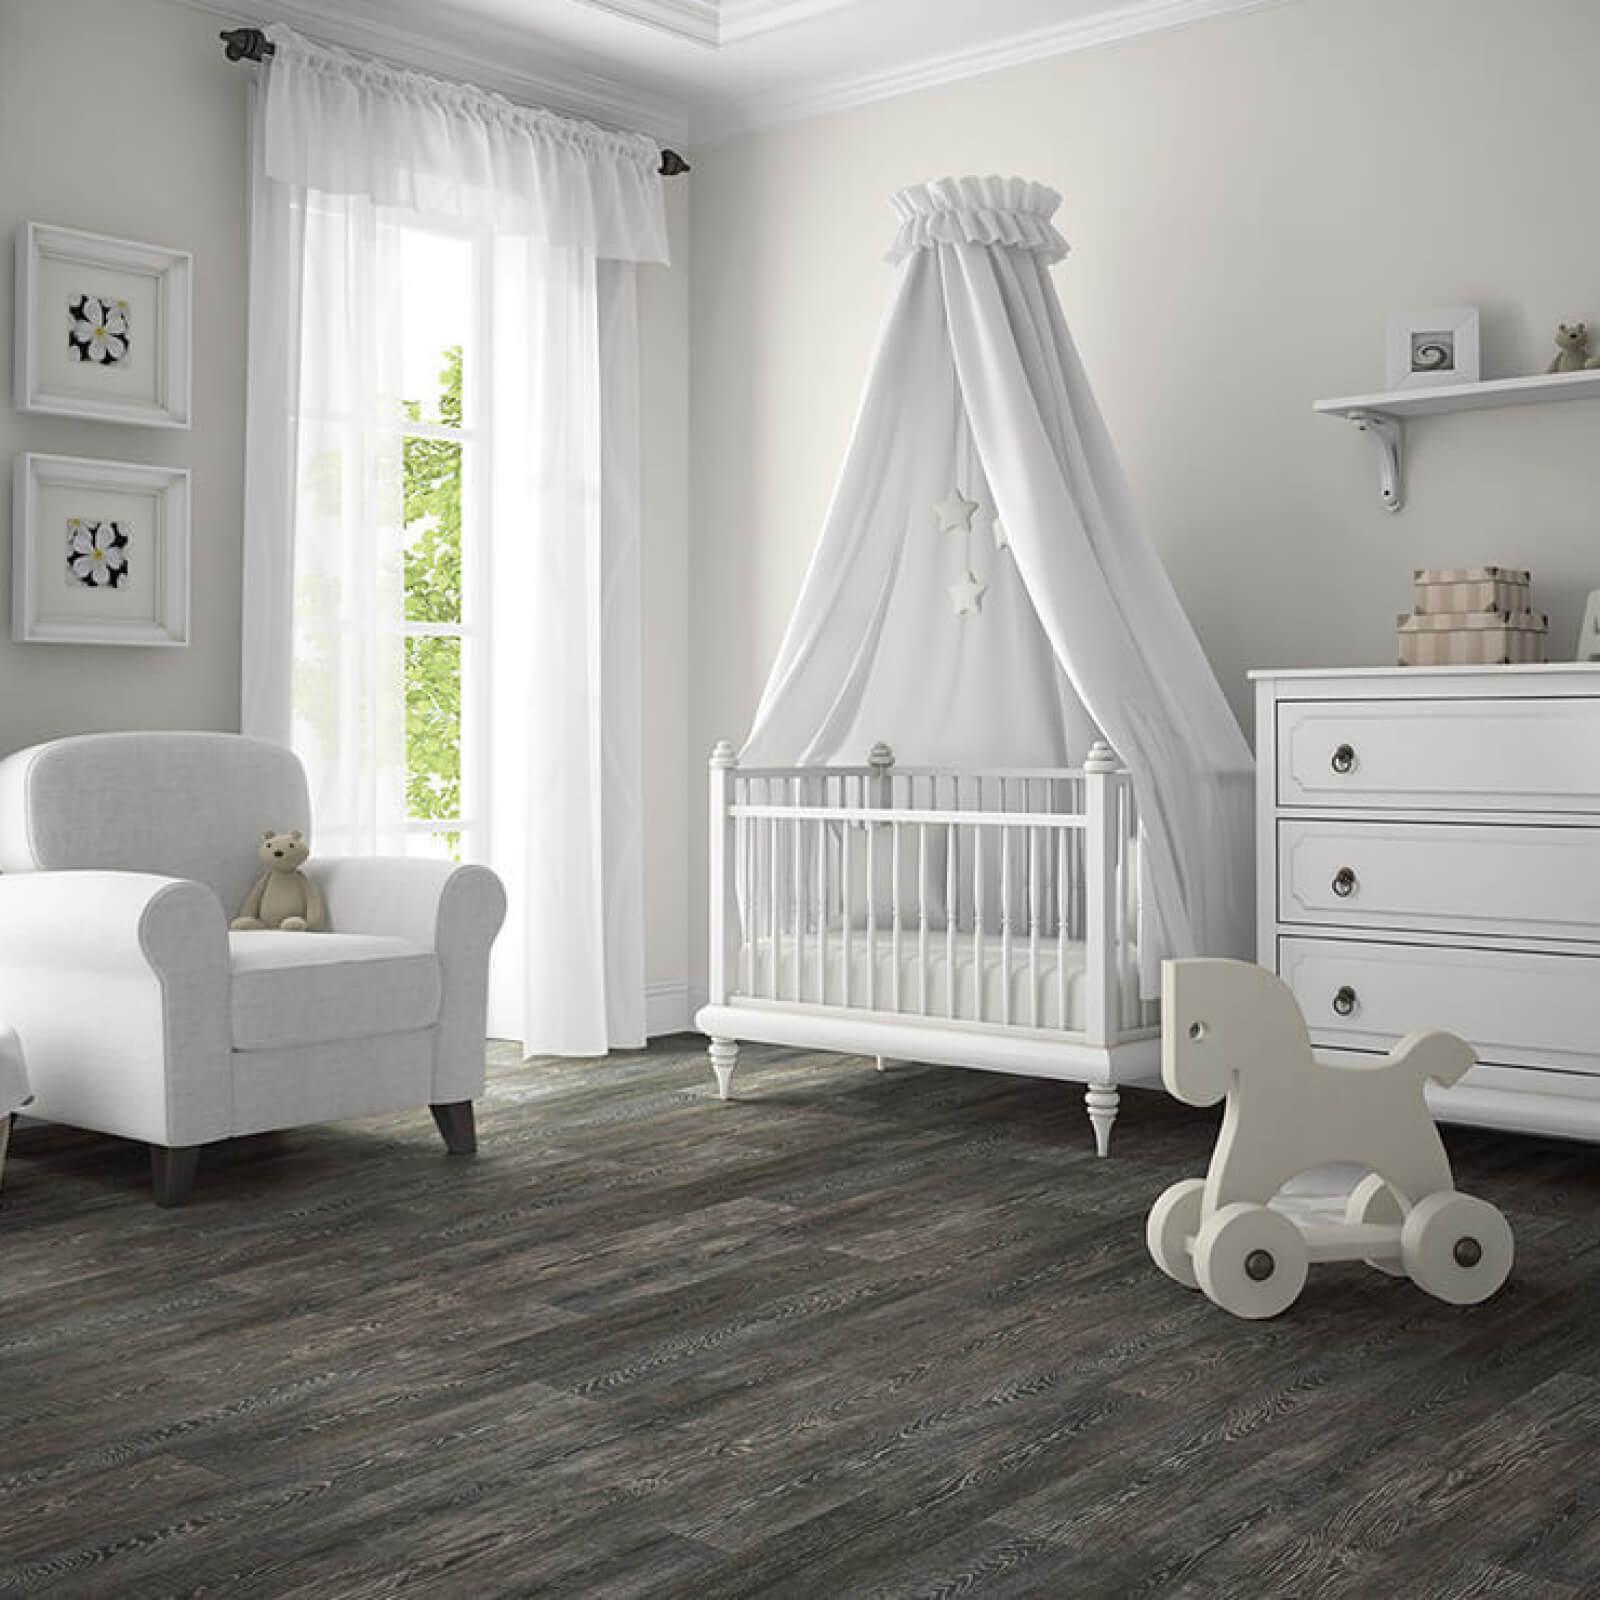 Vinyl Floors in Nursery | Haley's Flooring & Interiors